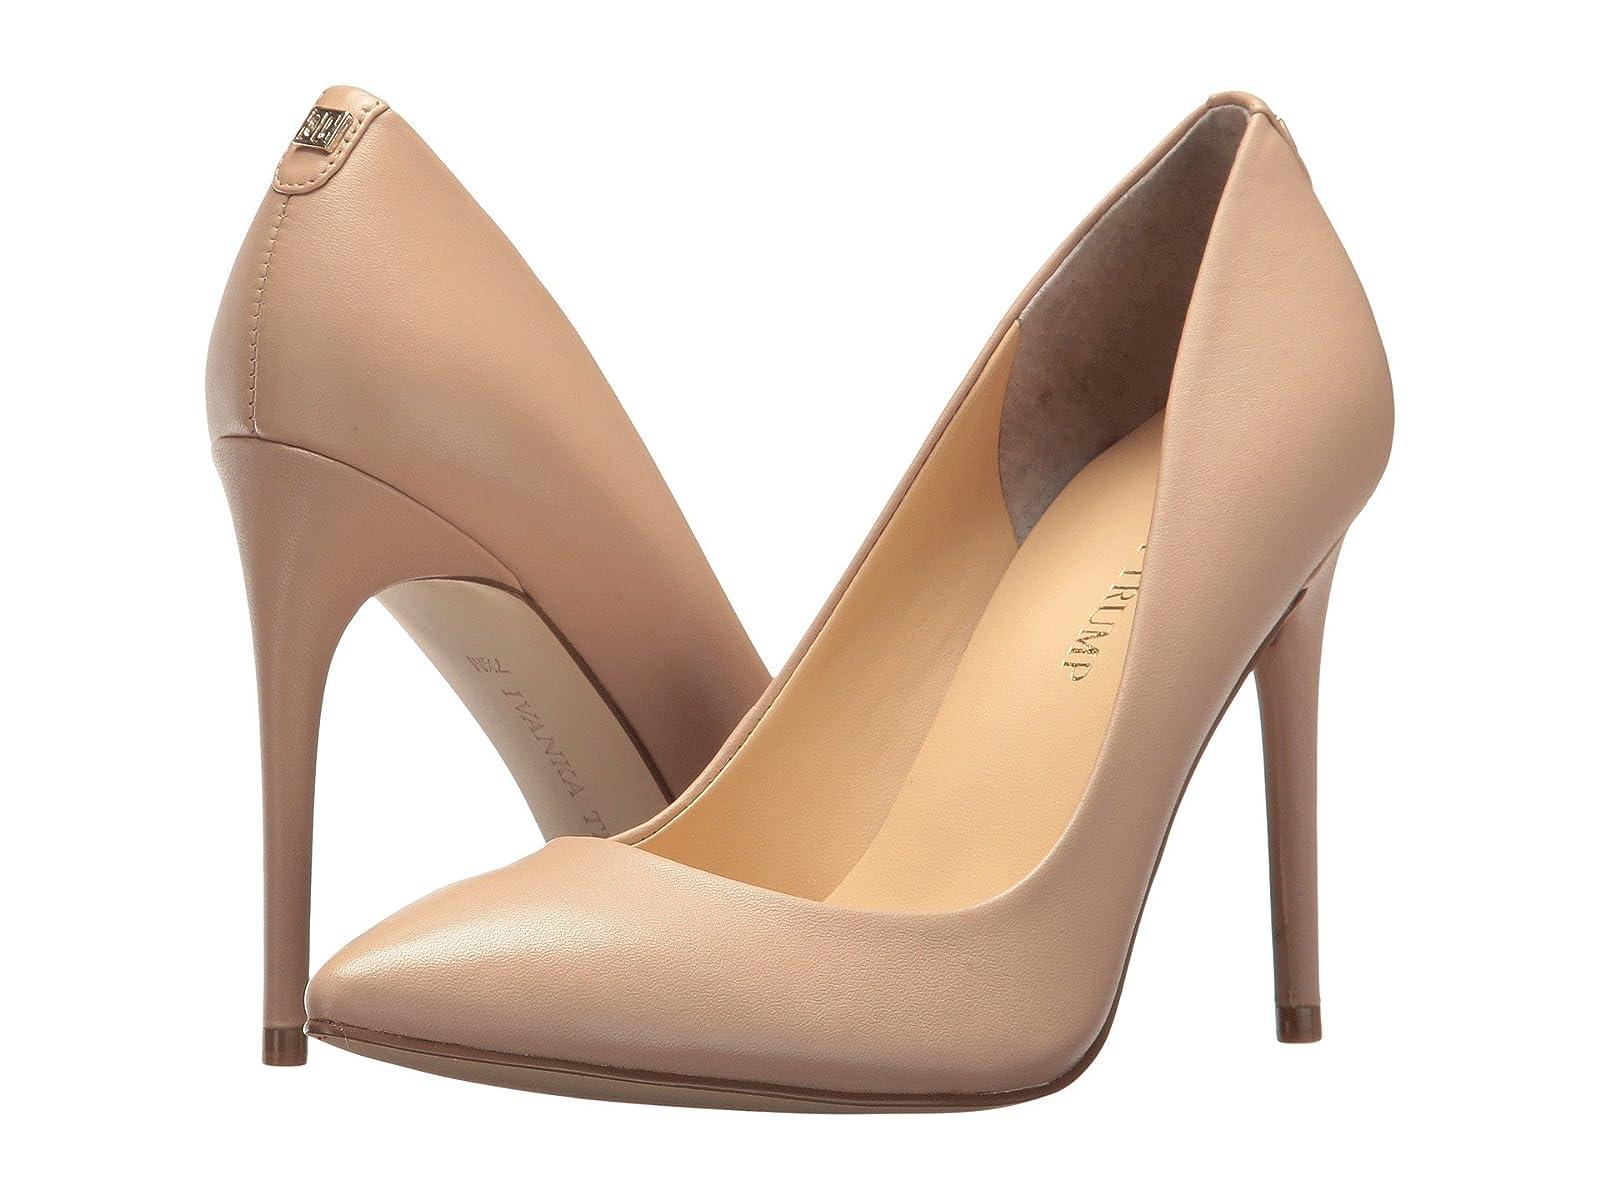 Ivanka Trump Kayden 4 Styles < Different Styles And Styles 4 <Man's/Woman's 100914